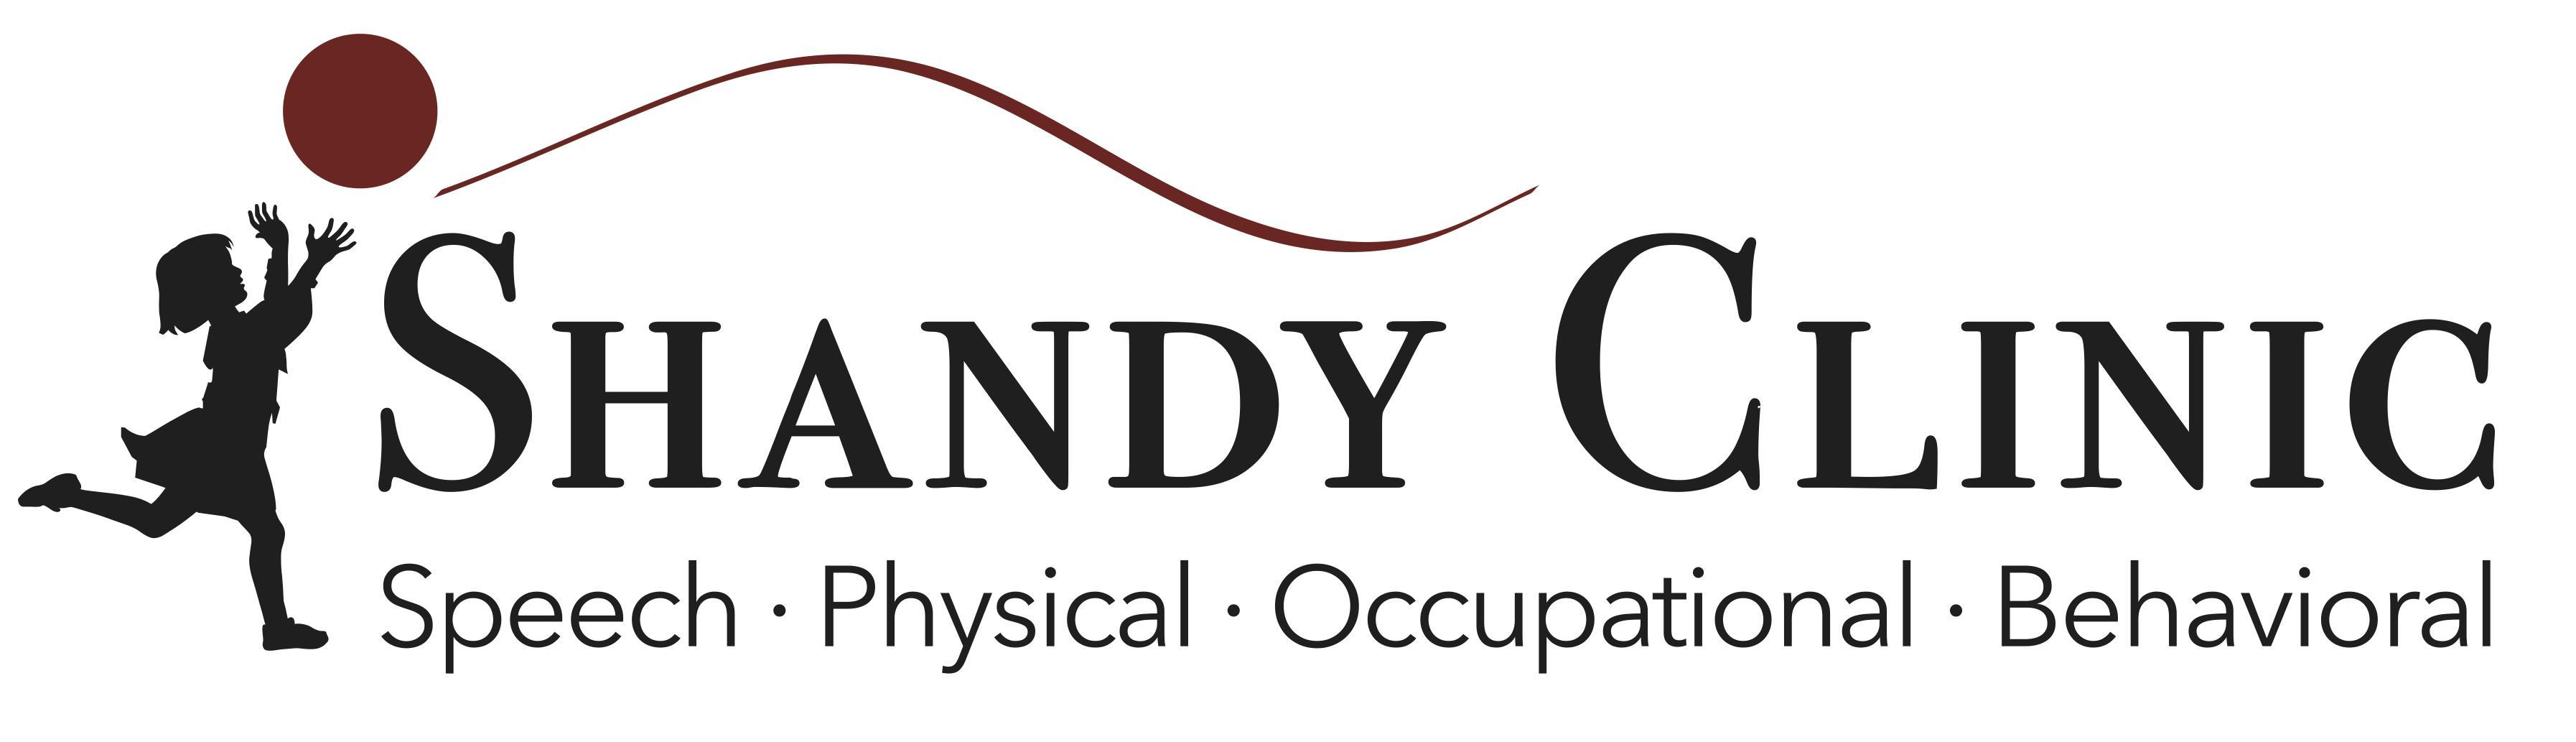 Shandy Clinic Logo